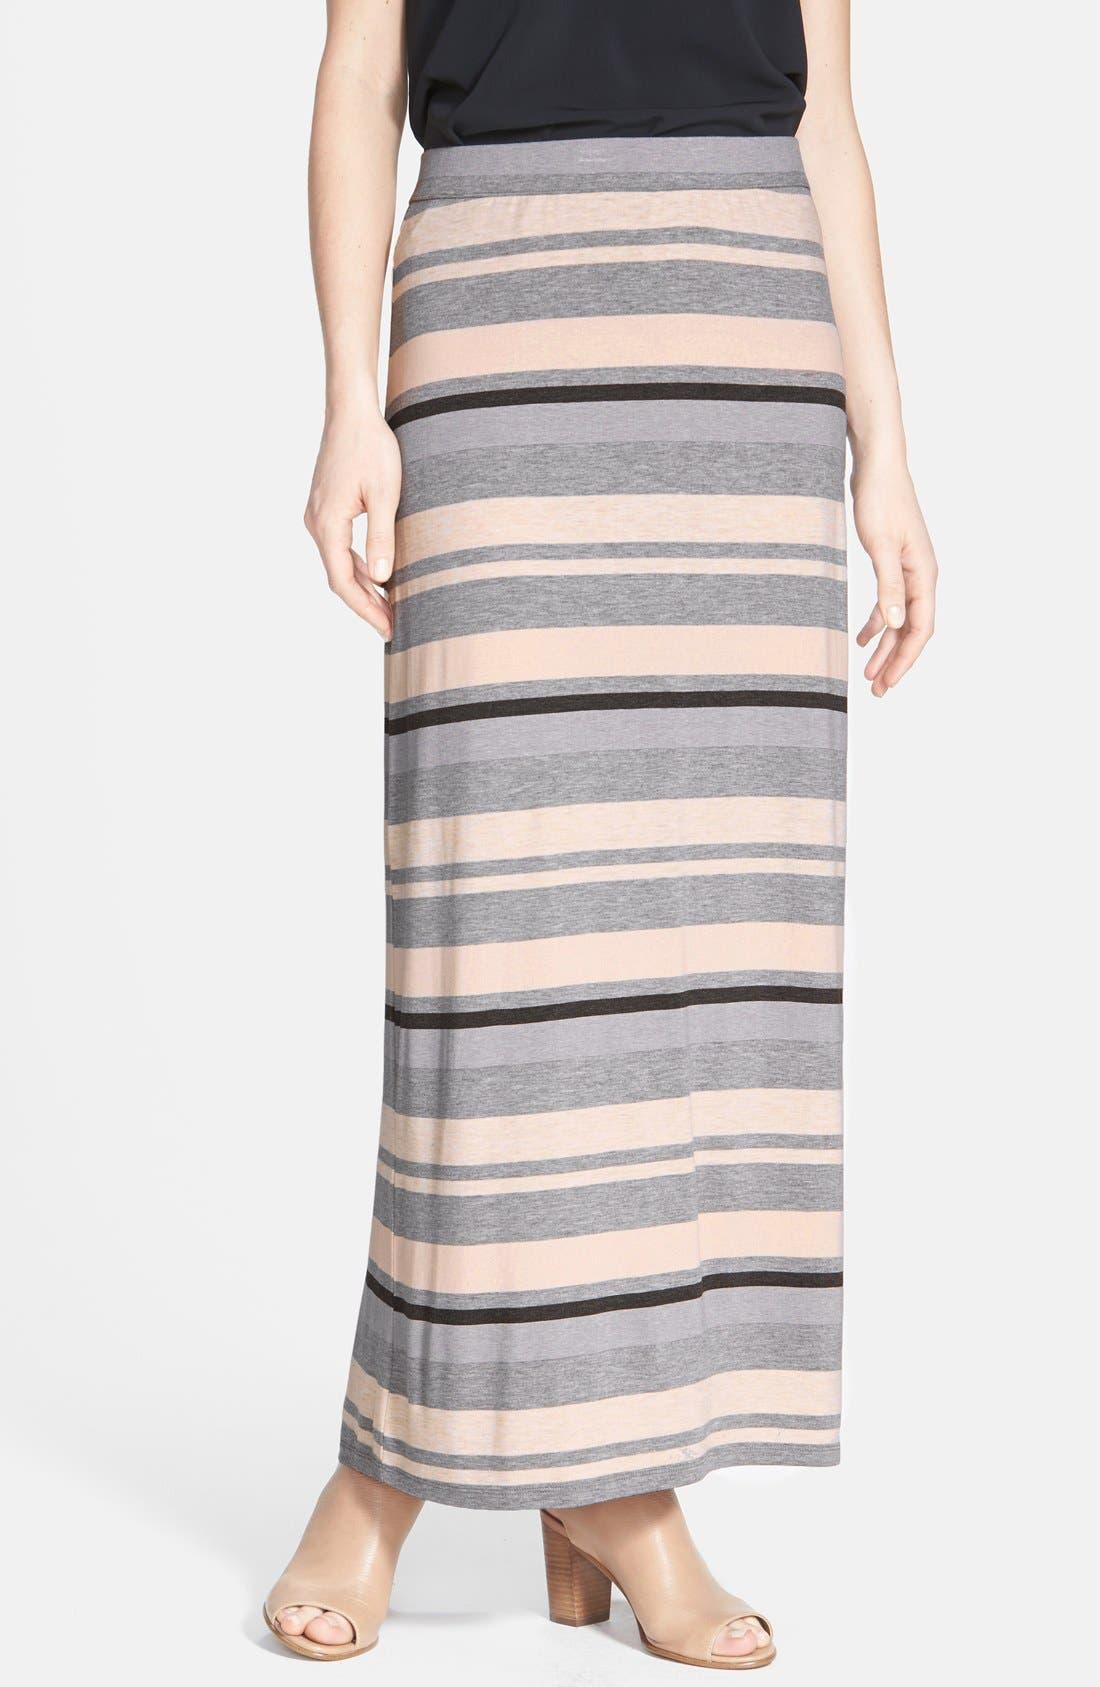 Alternate Image 1 Selected - Jessica Simpson 'Sam' Maxi Skirt